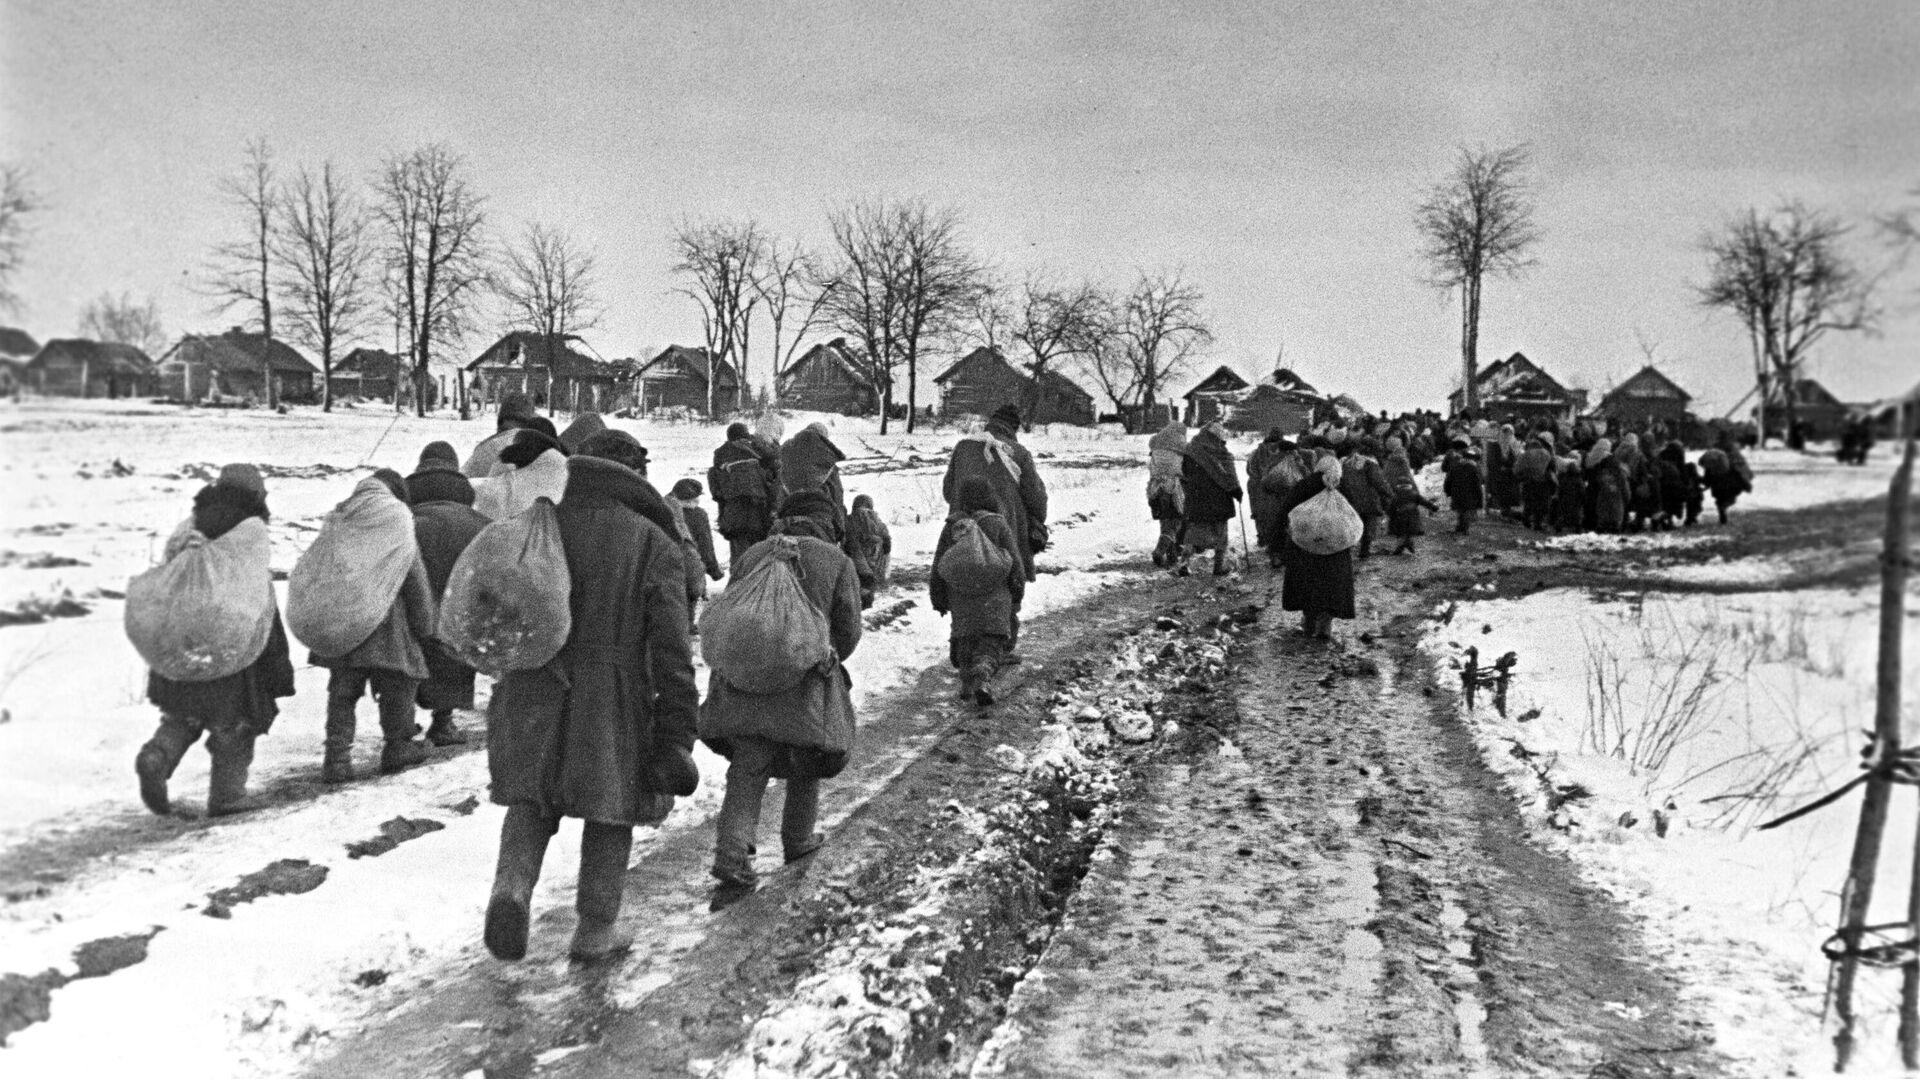 Ciudadanos soviéticos durante la Gran Guerra Patria - Sputnik Mundo, 1920, 22.06.2021